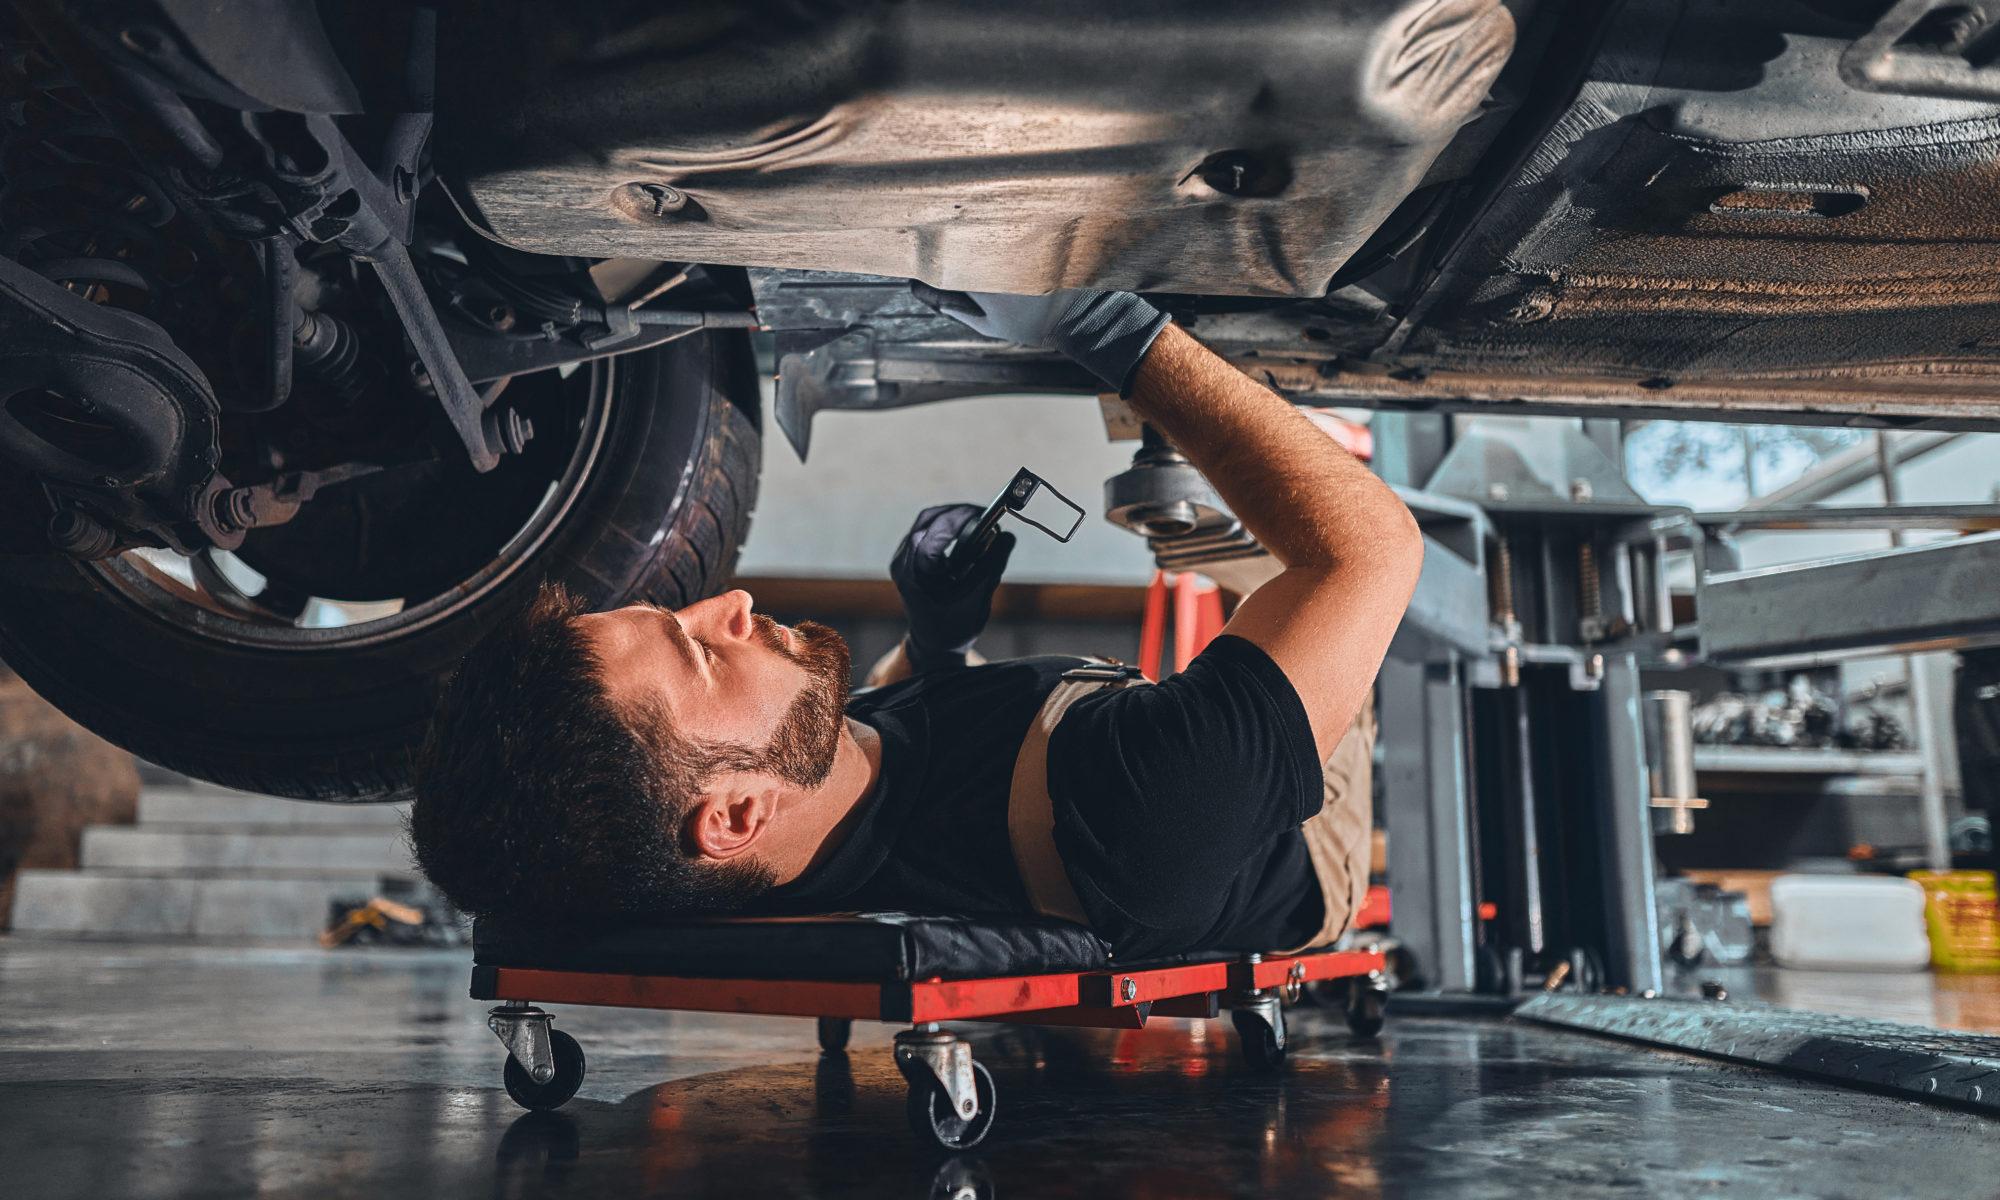 AdobeStock 412460677 2000x1200 - Hartz IV: Jobcenter muss Fahrzeugreparatur bezahlen